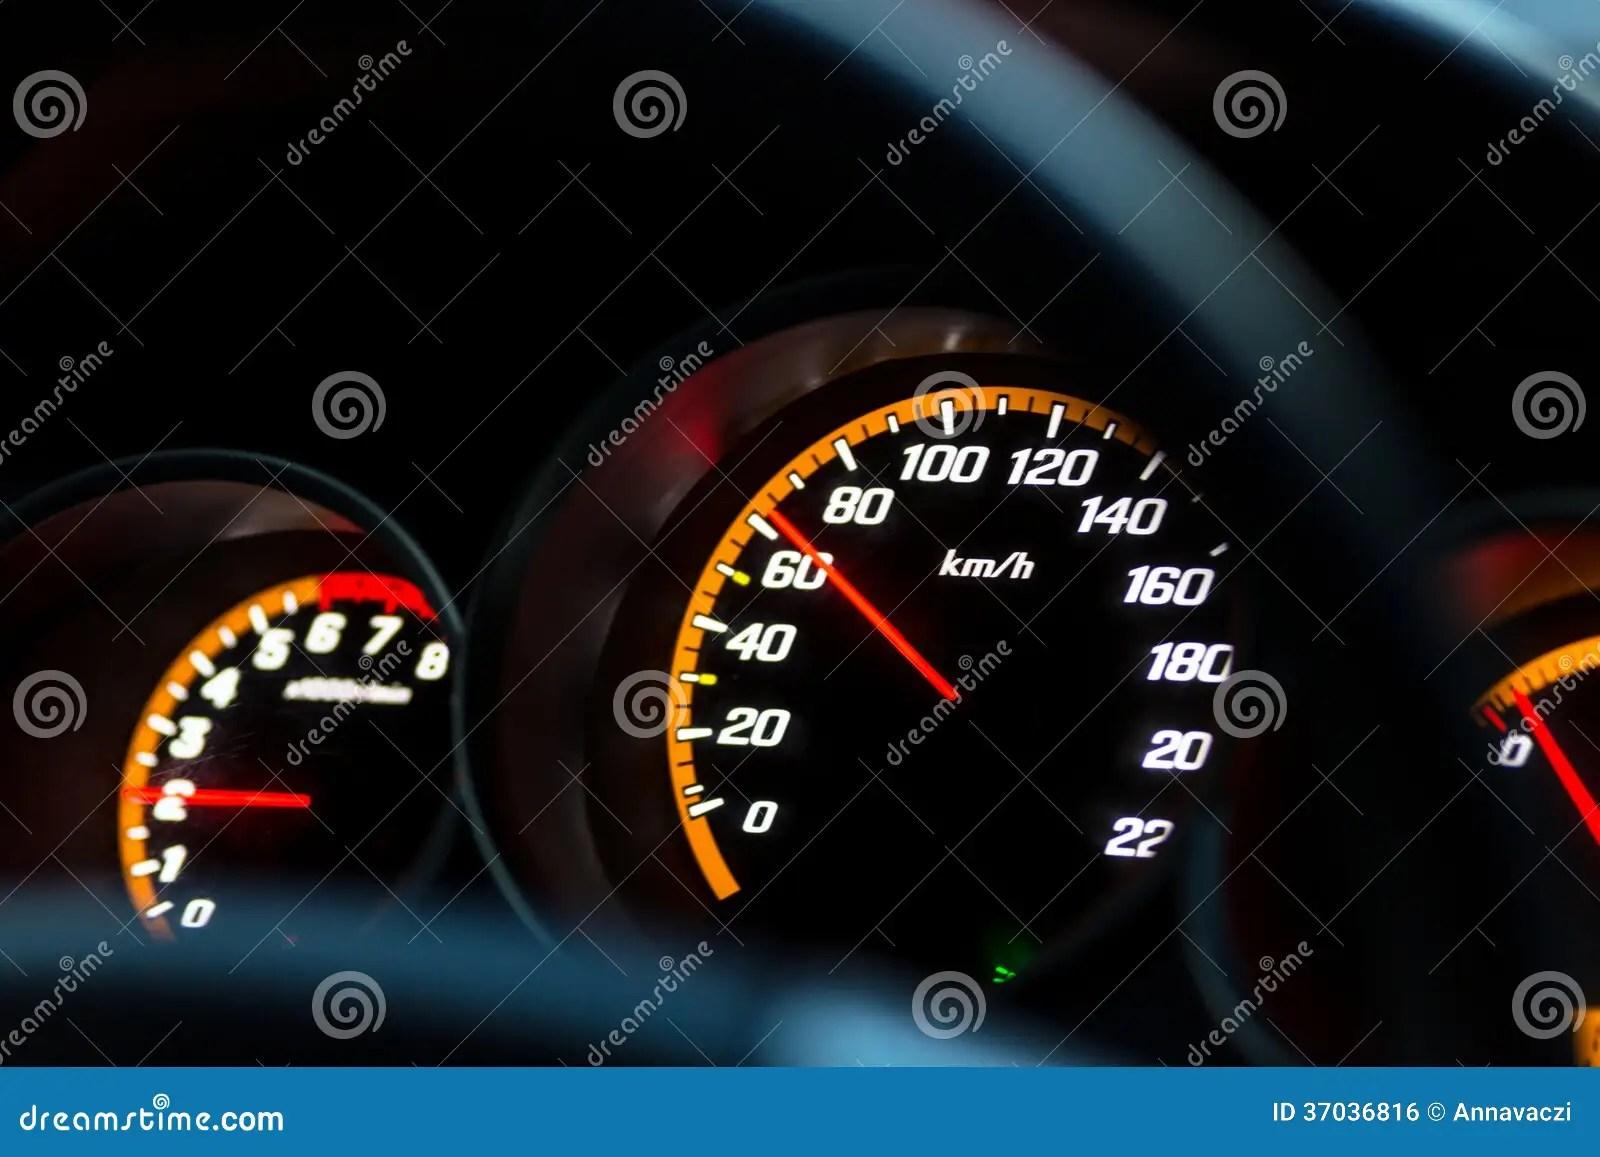 Car Instrument Panel Stock Photo Image Of Measurement